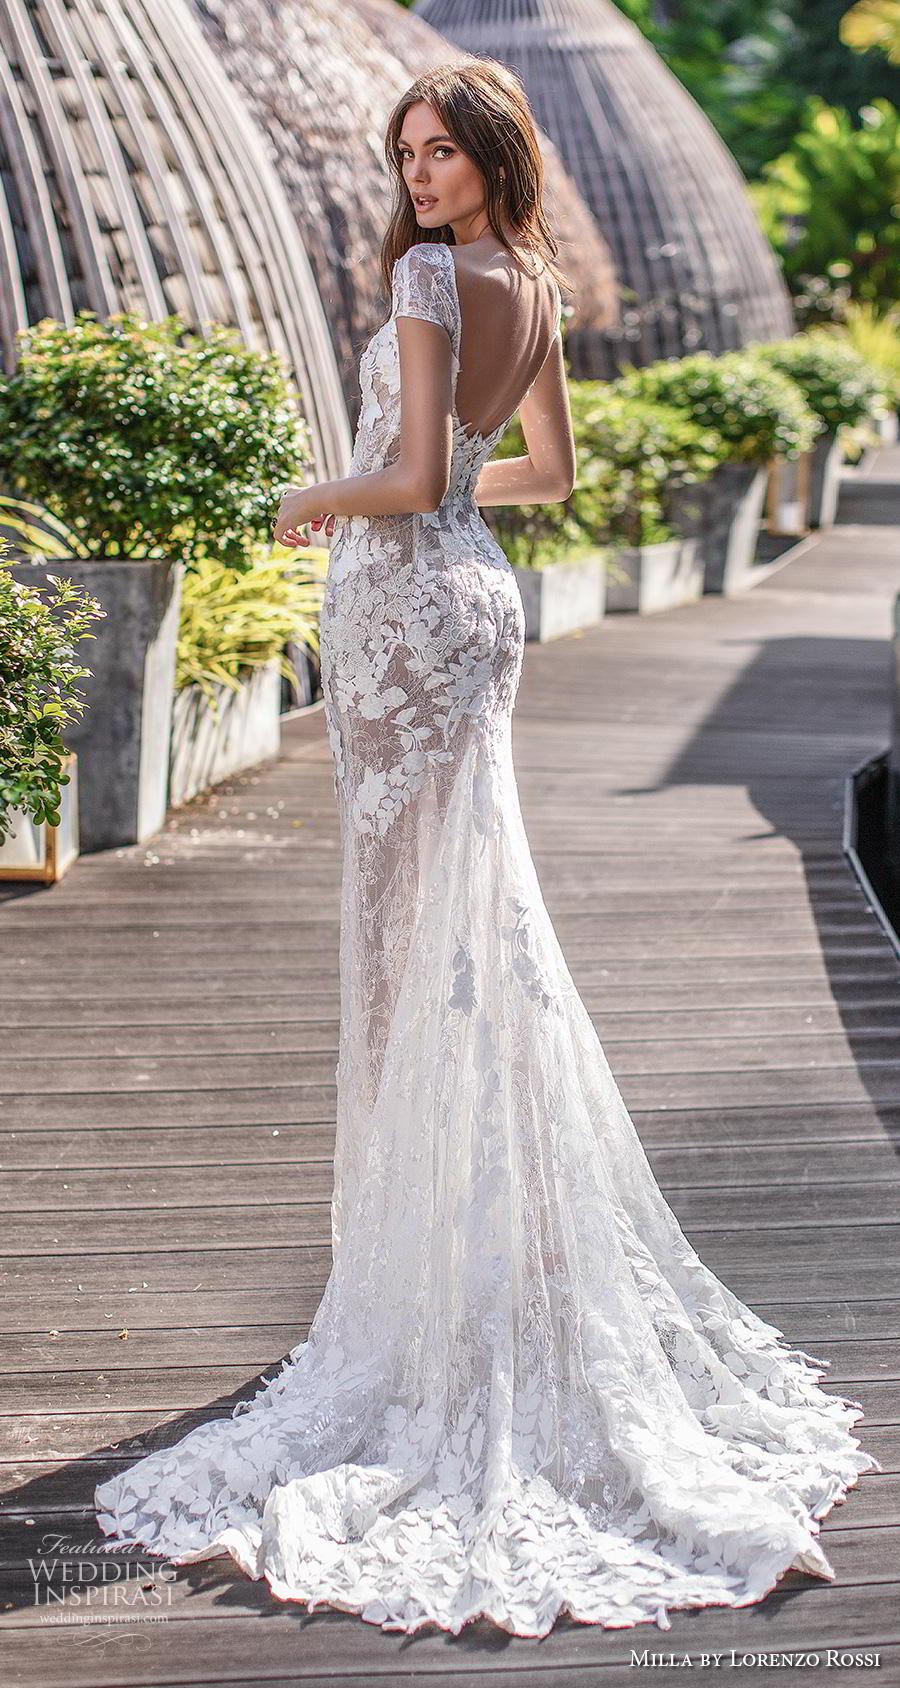 lorenzo rossi 2019 milla bridal short sleeves bateau neckline full embellishment elegant fit and flare wedding dress backless chapel train (8) bv